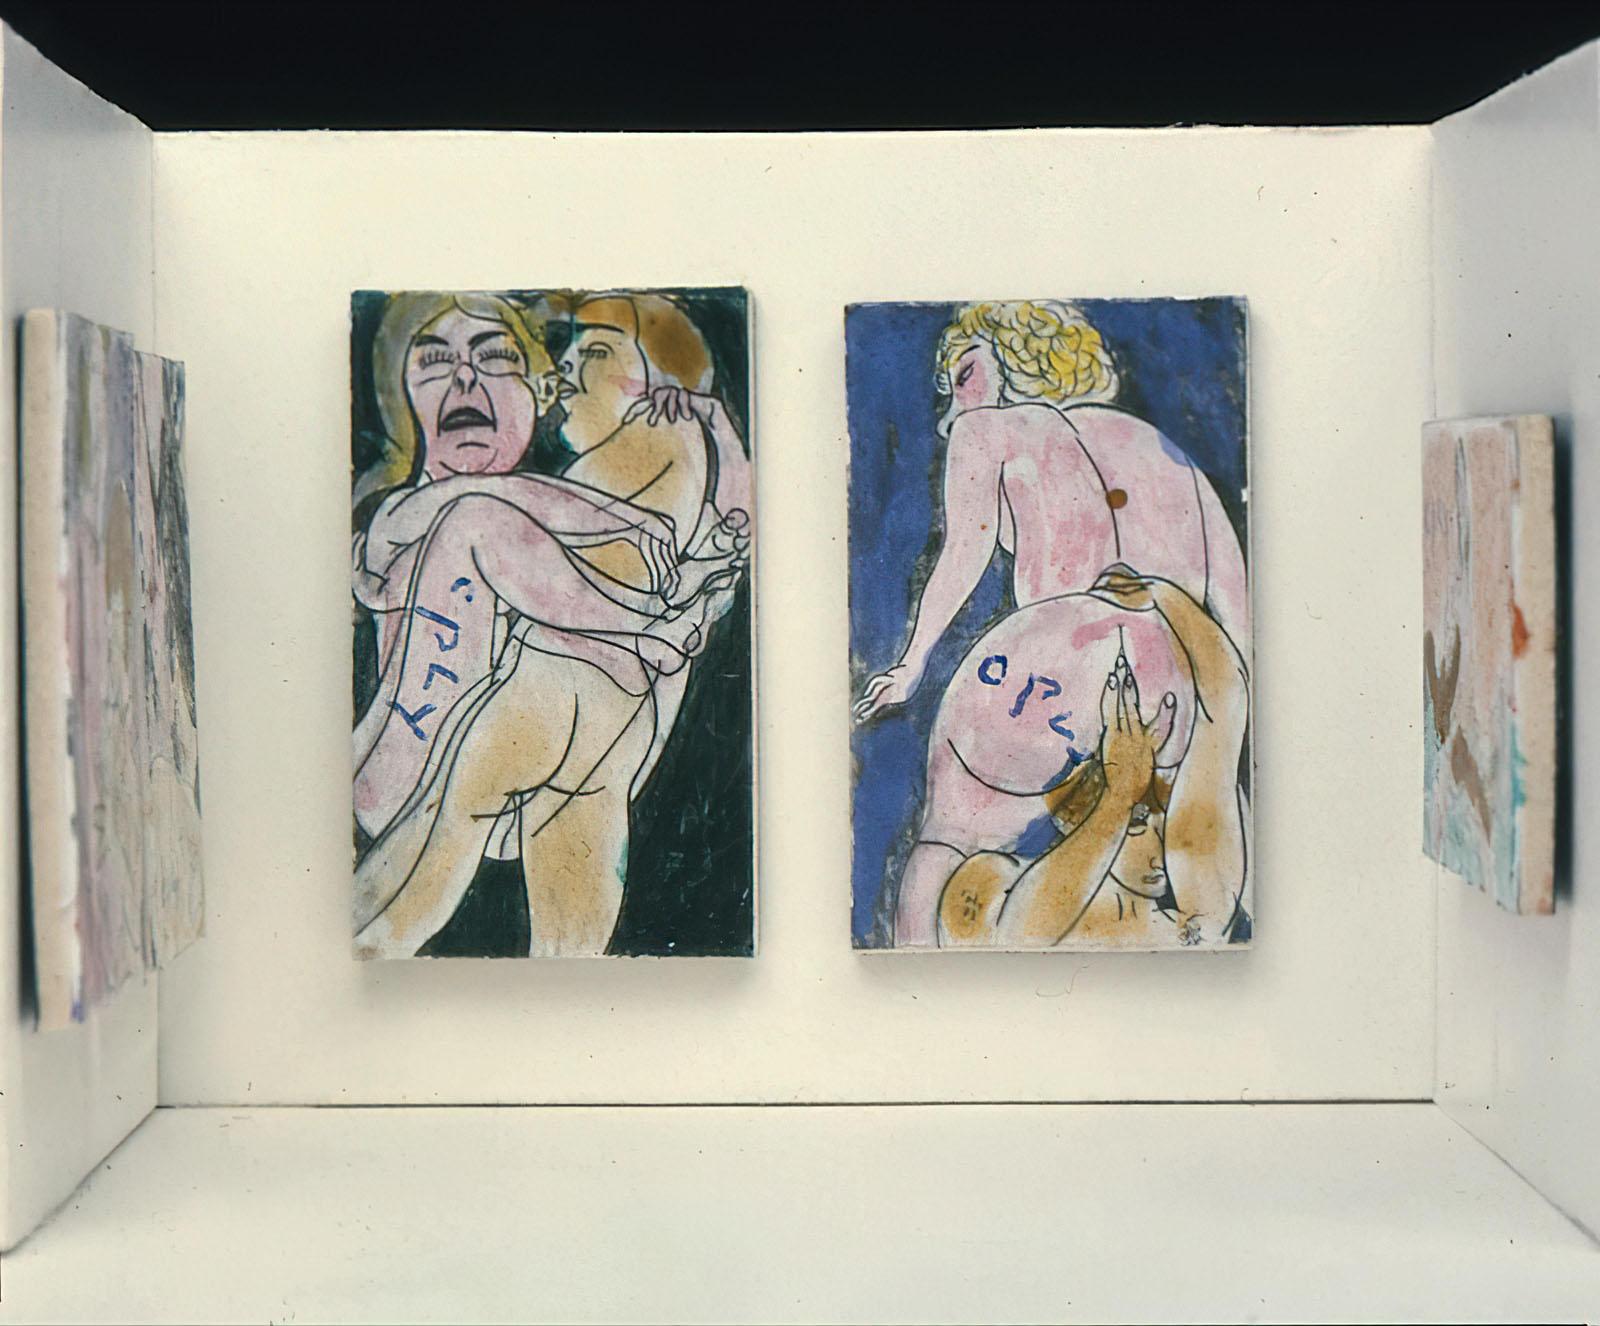 William Copley - Untitled